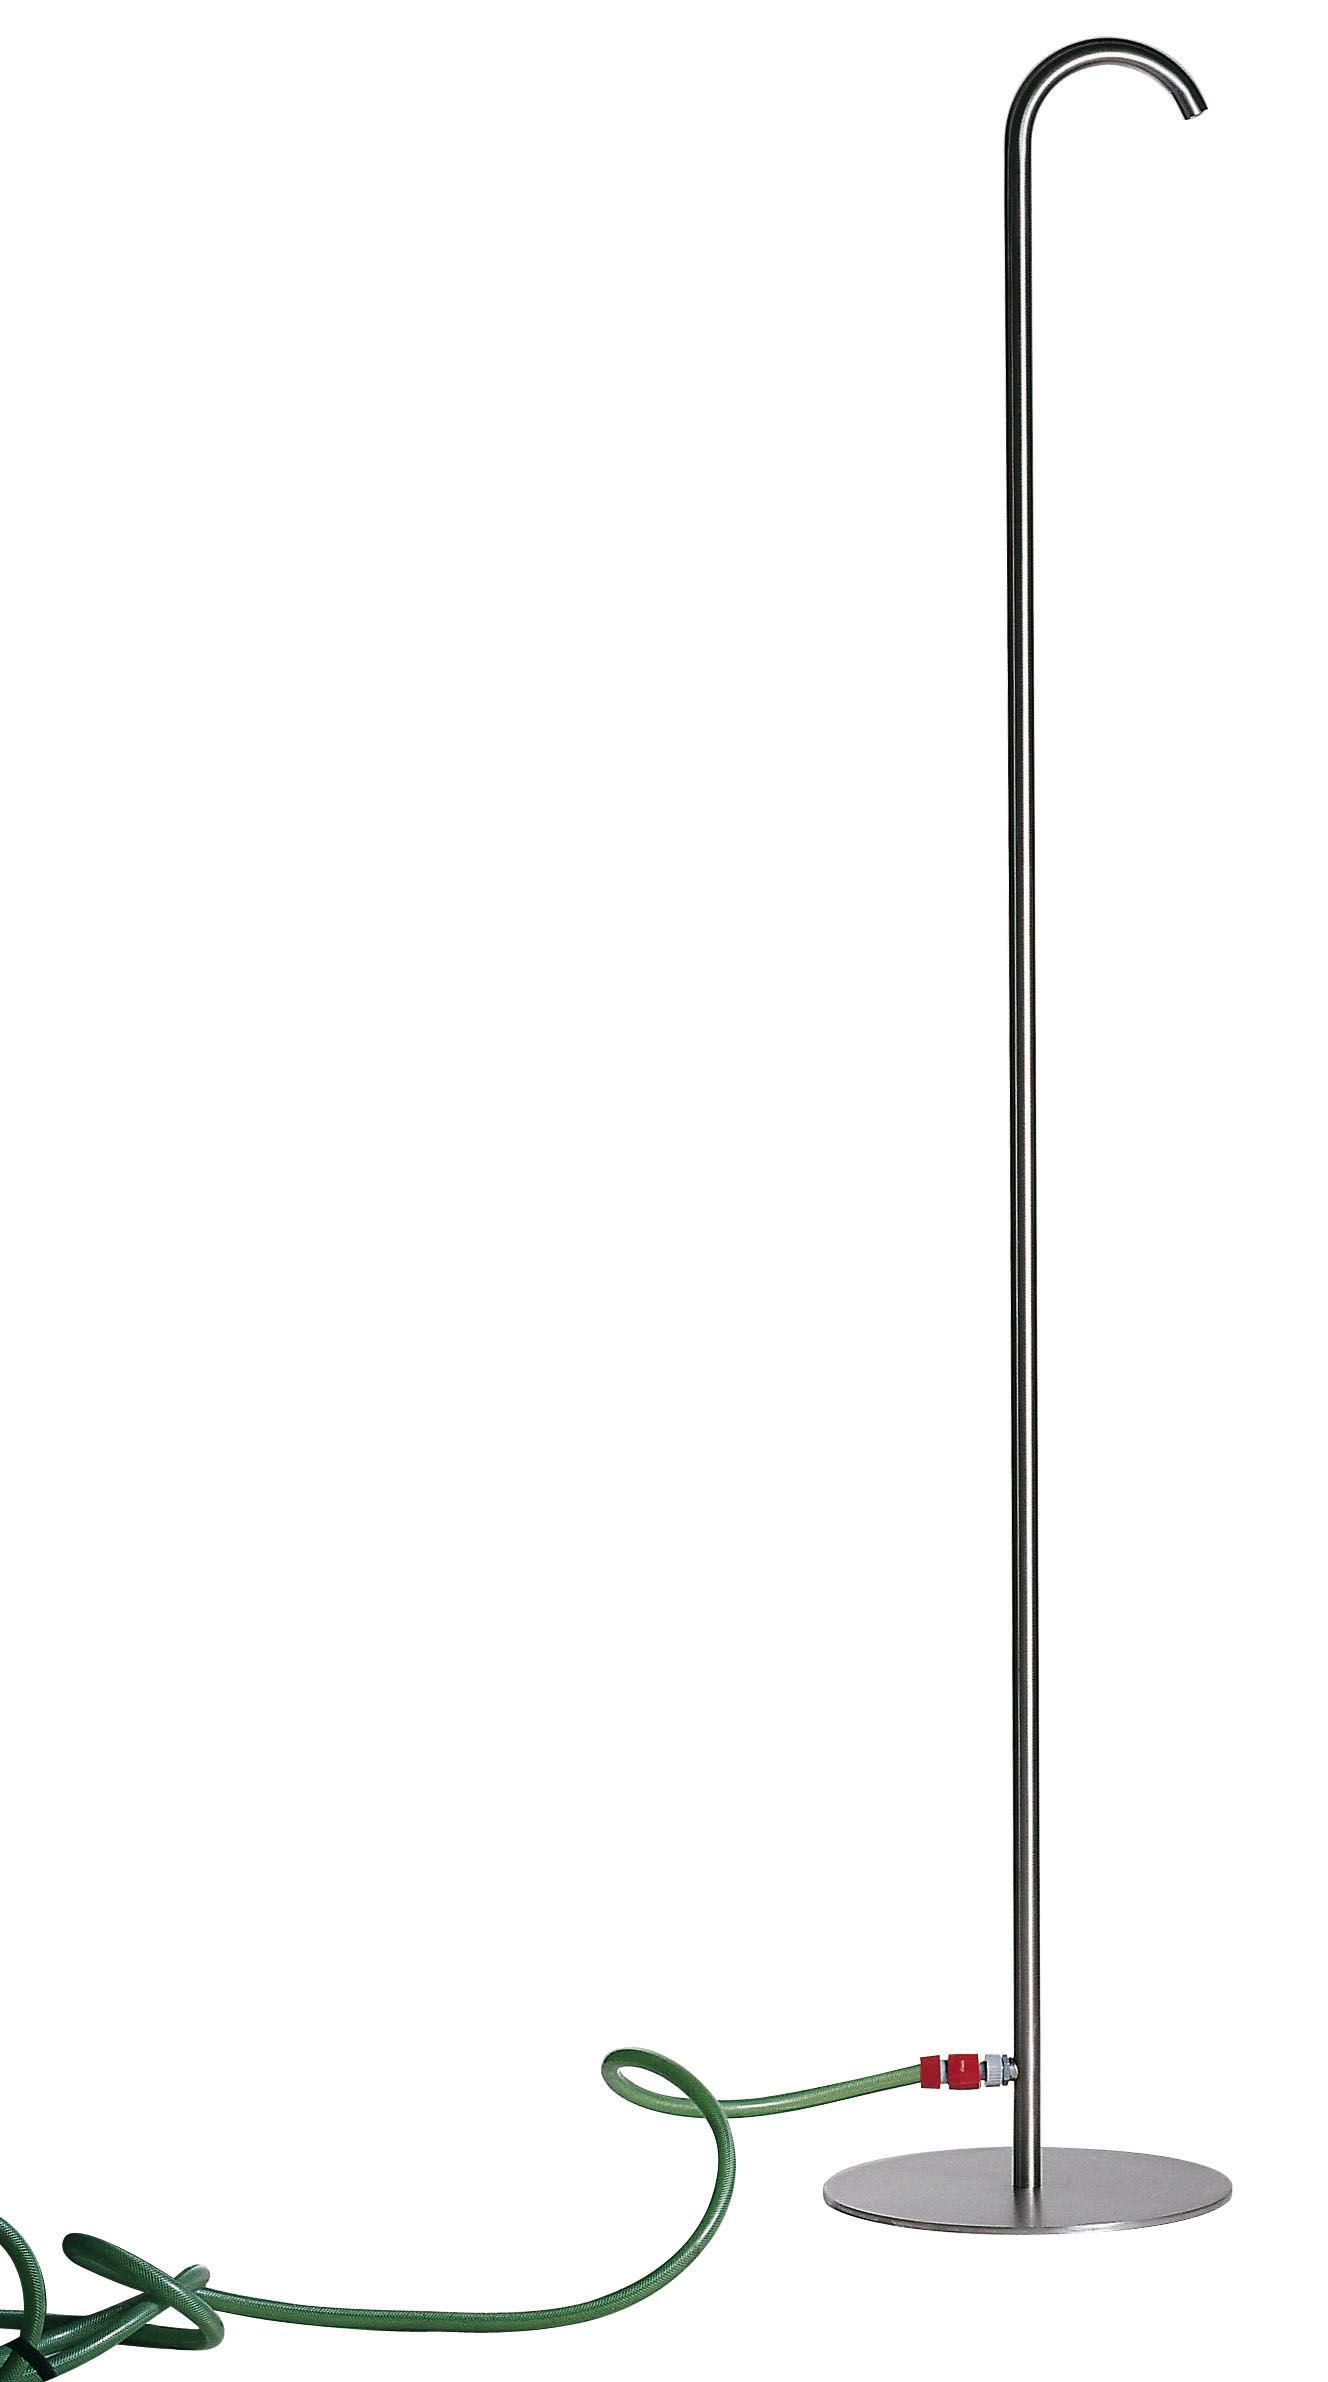 Outdoor - Showers - Screw Outdoor shower by Coro - Steel - Stainless steel